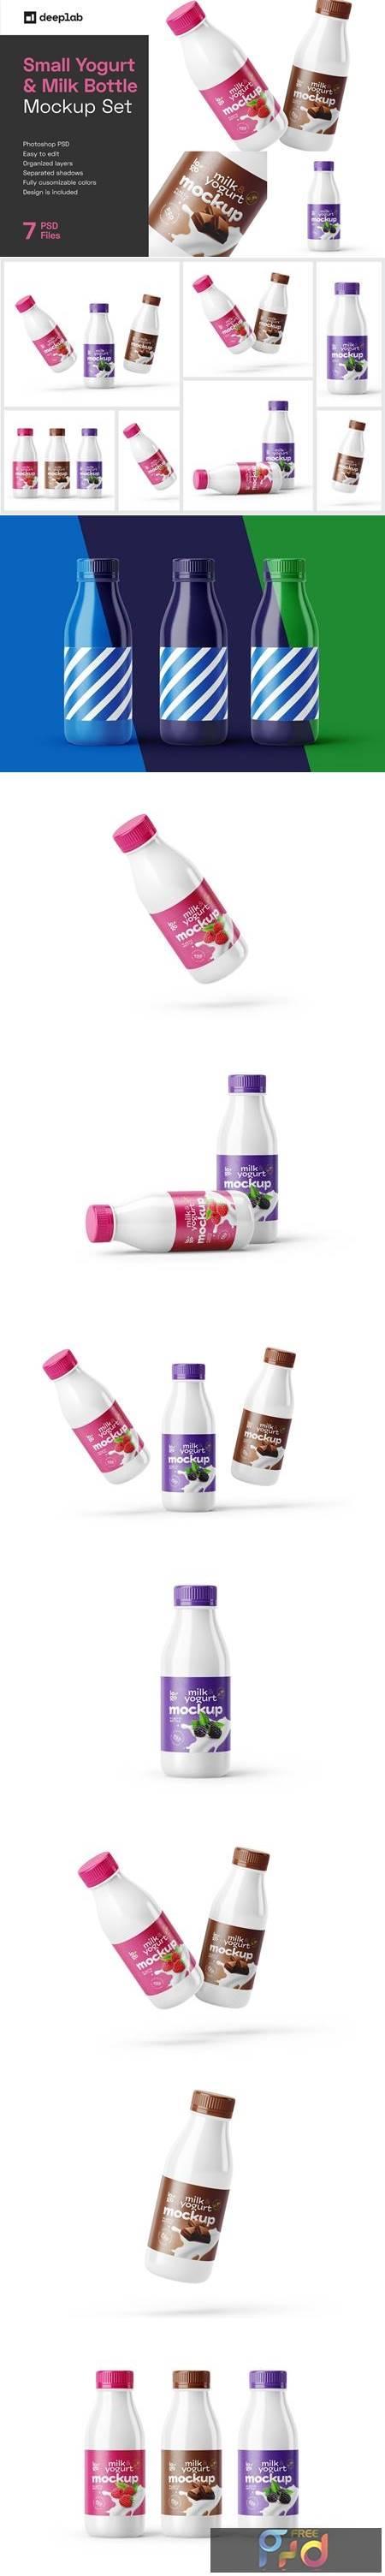 Small Yogurt & Milk Bottle Mockup 5891639 1